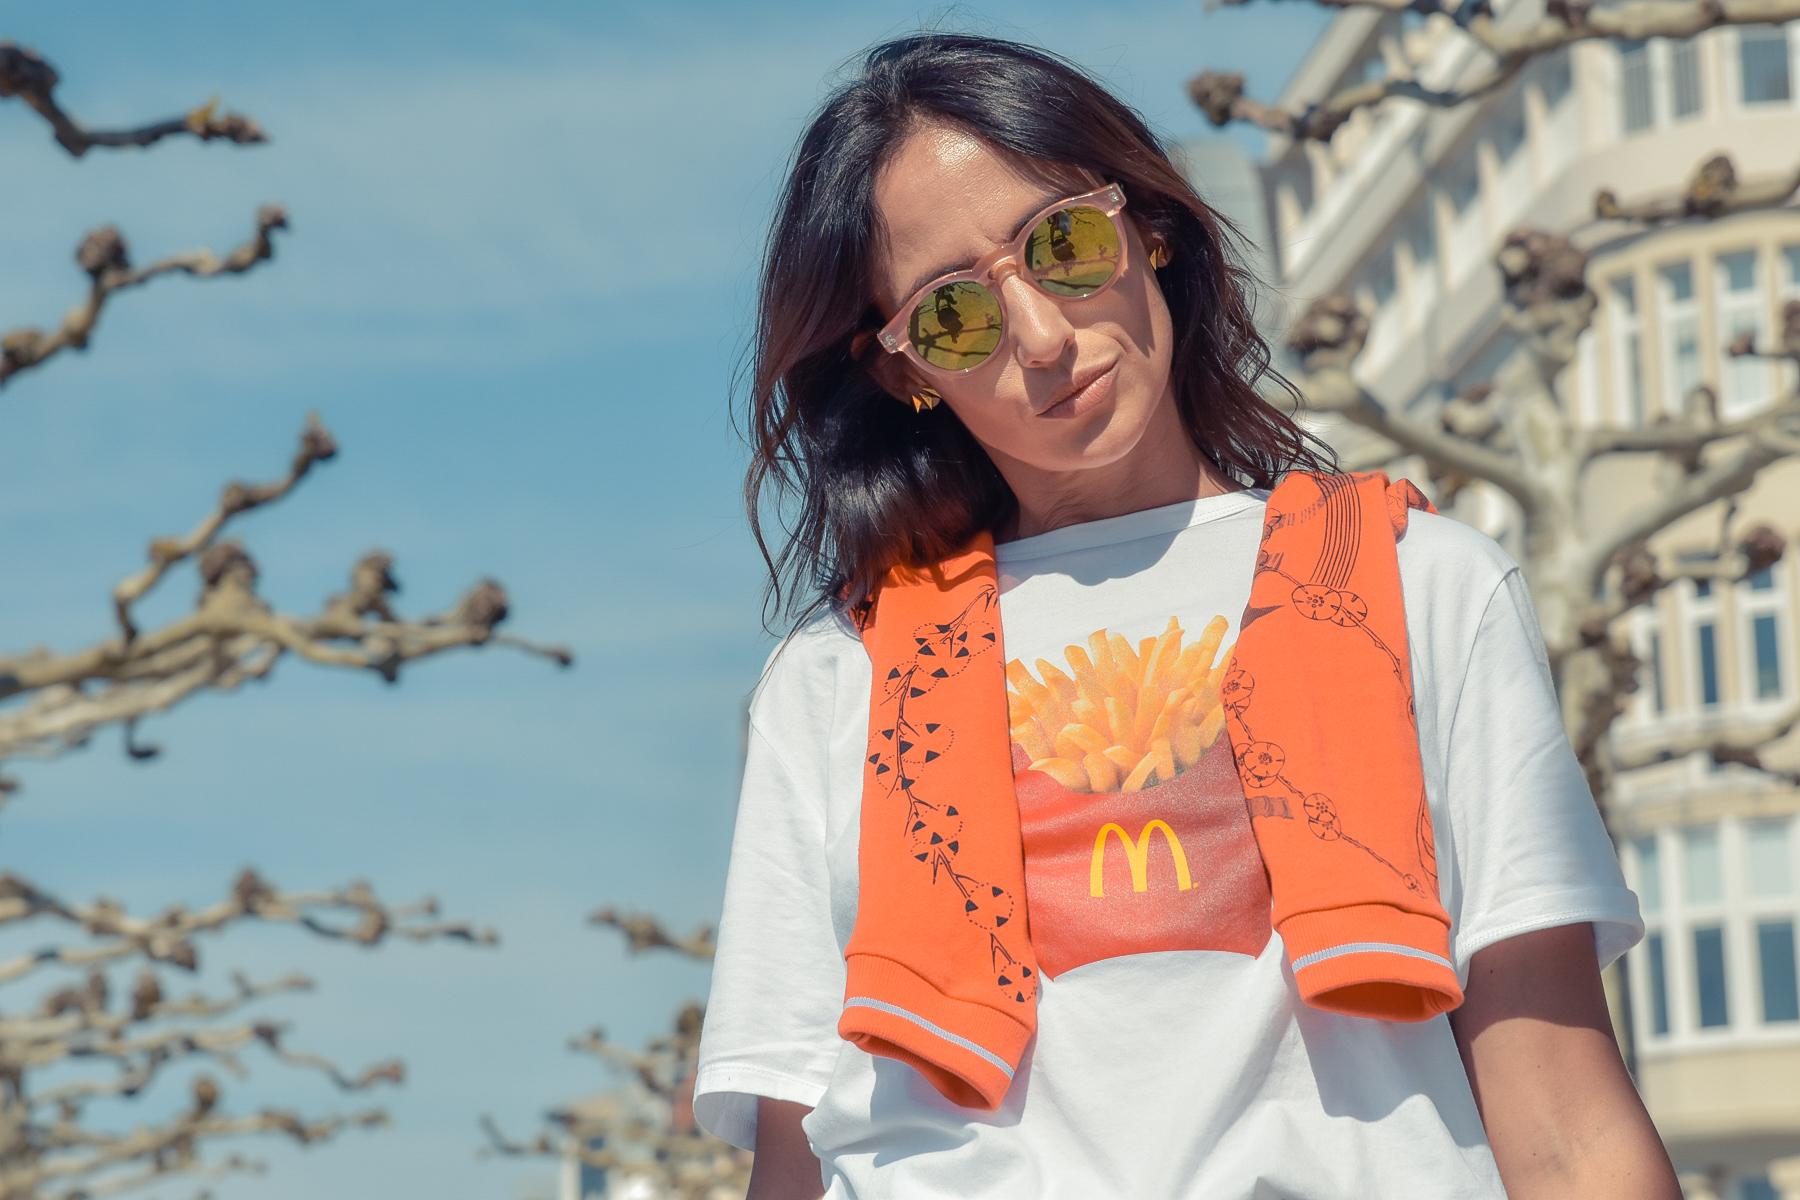 el-blog-de-silvia-viajar-dusseldorf-jersey-geometrico-jeans-levis-03